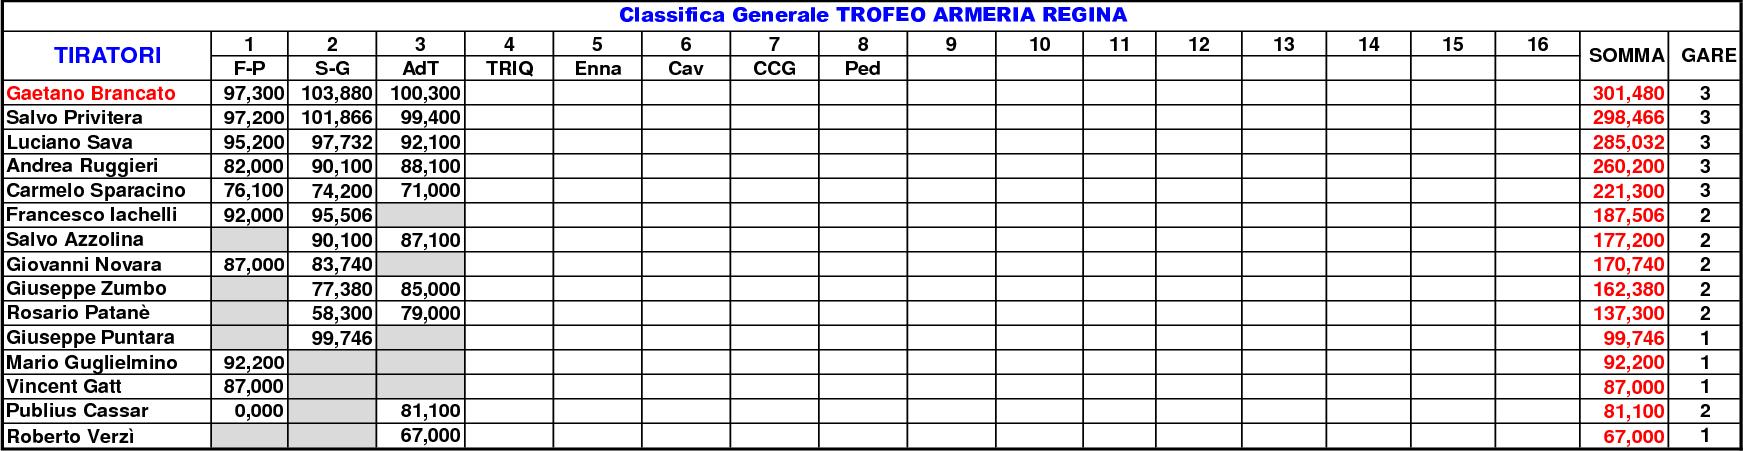 Classifica Generale 20216(2)